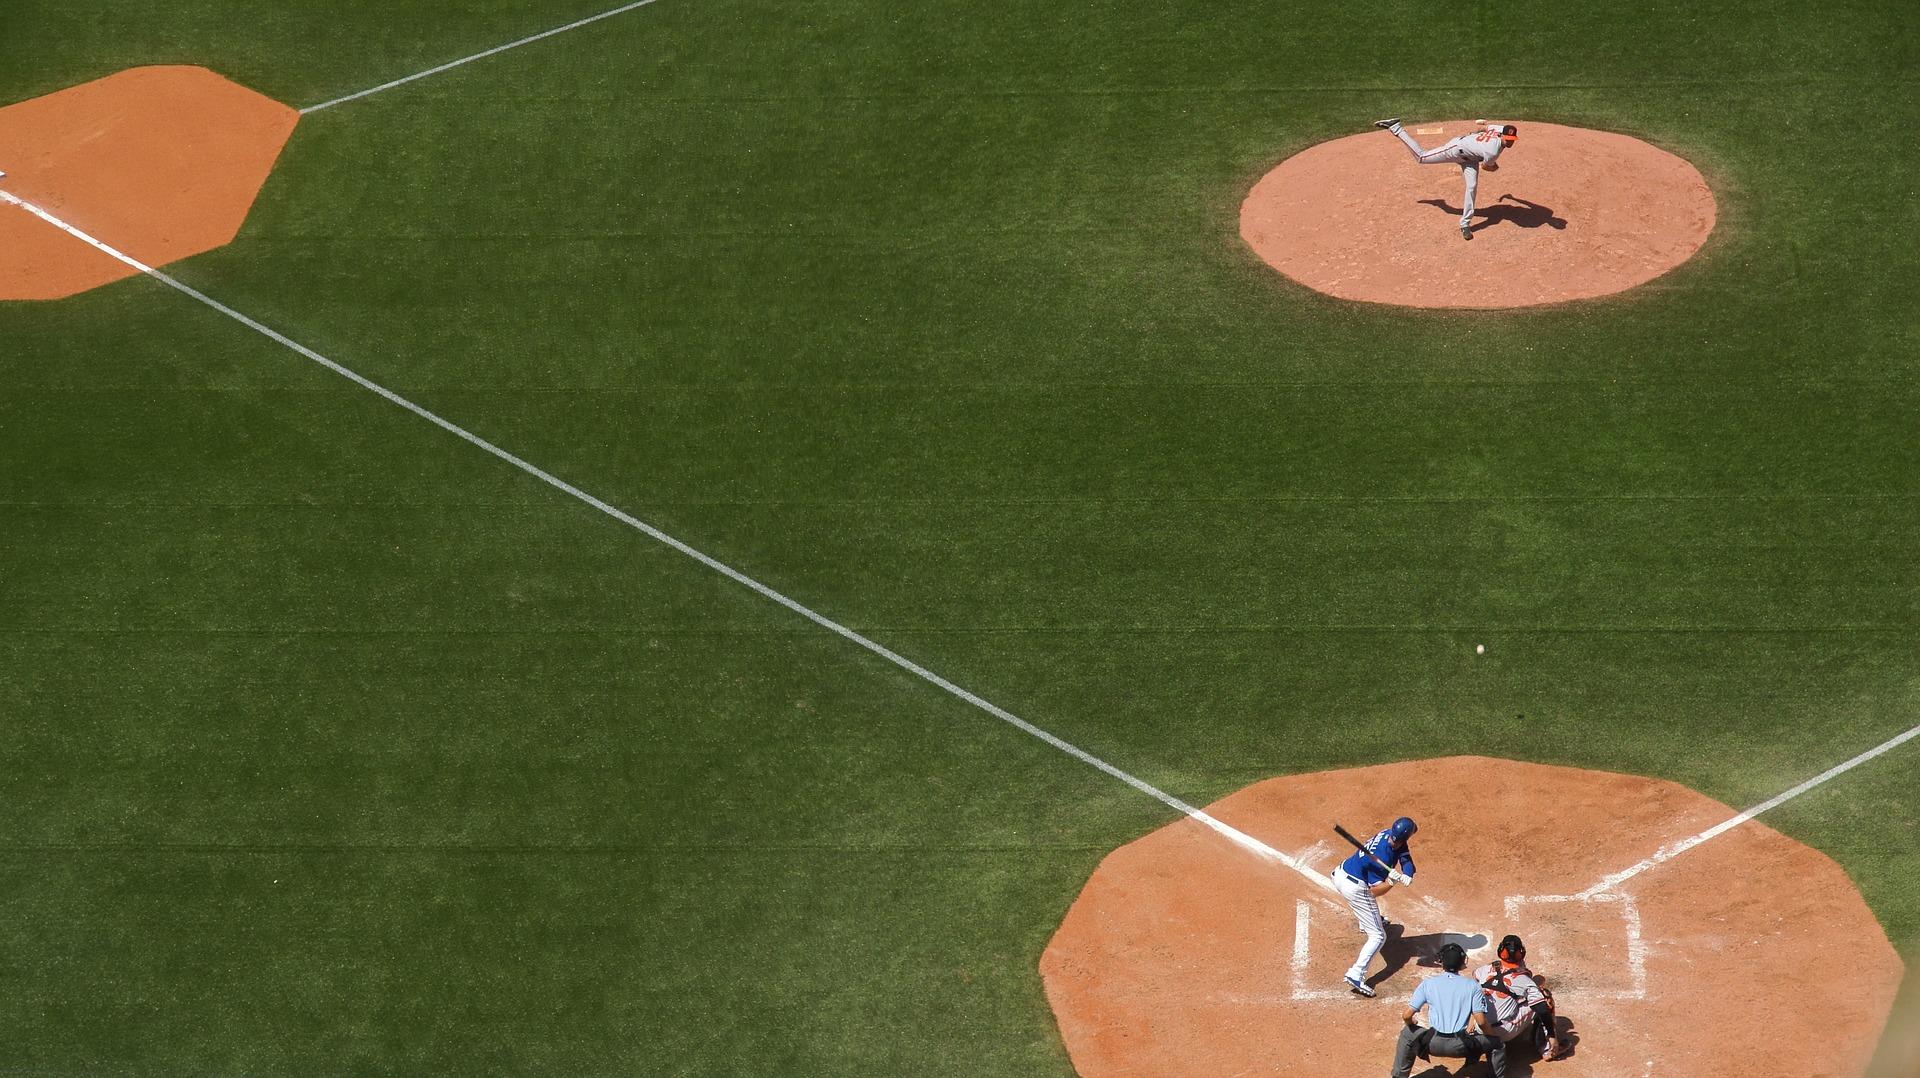 baseball-field-828713_1920.jpg